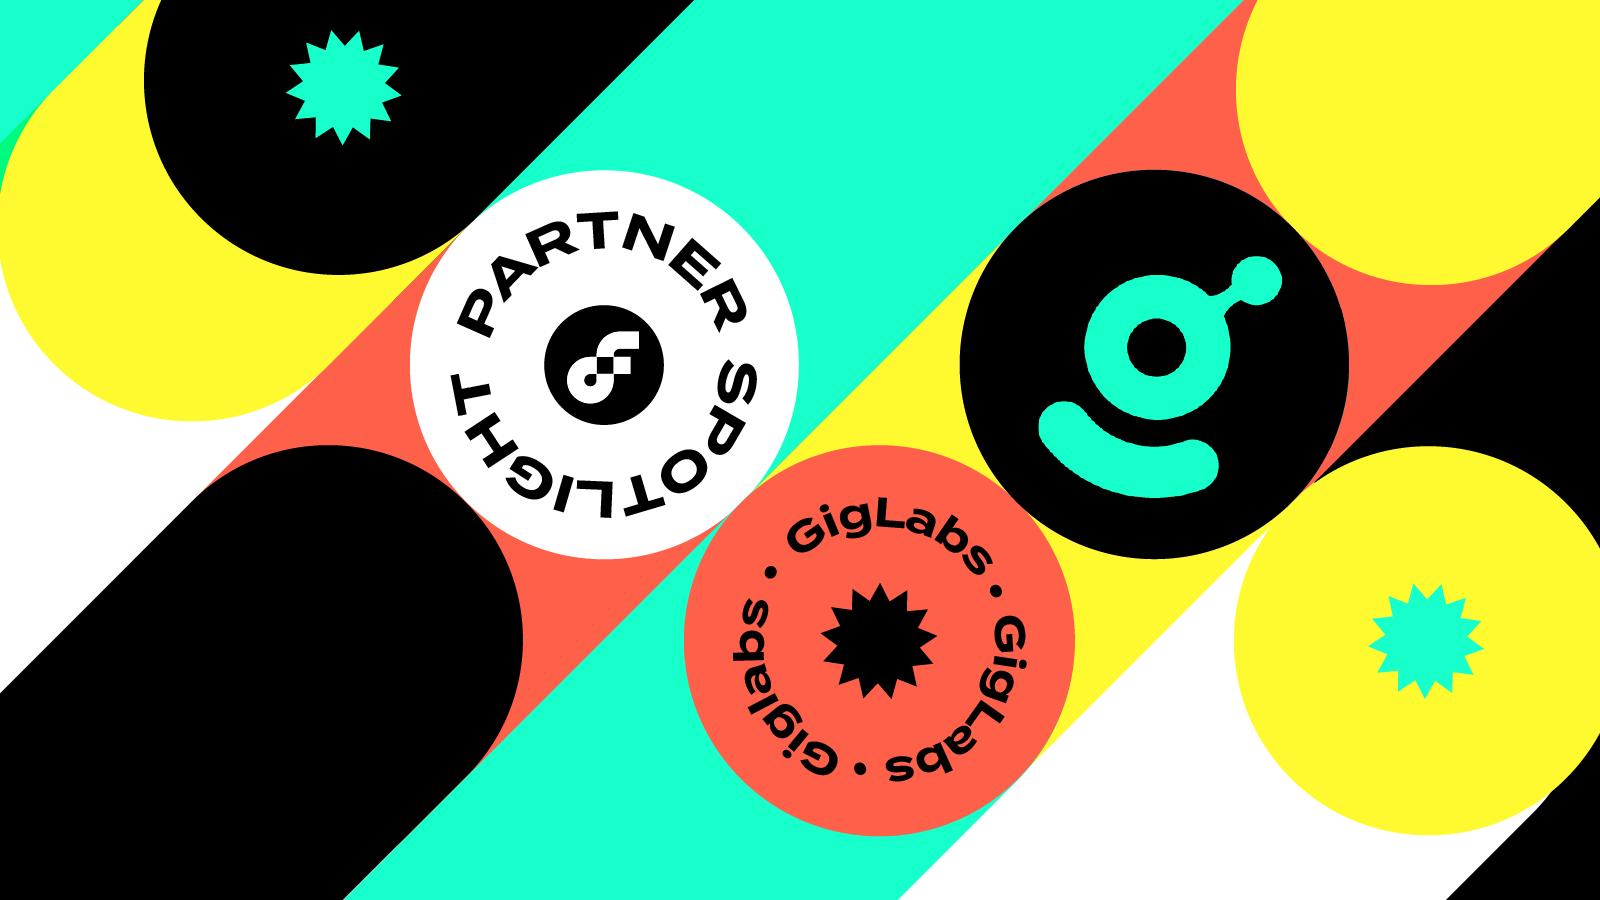 Partner Spotlight: GigLabs is Building the NFT Bridge for Brands